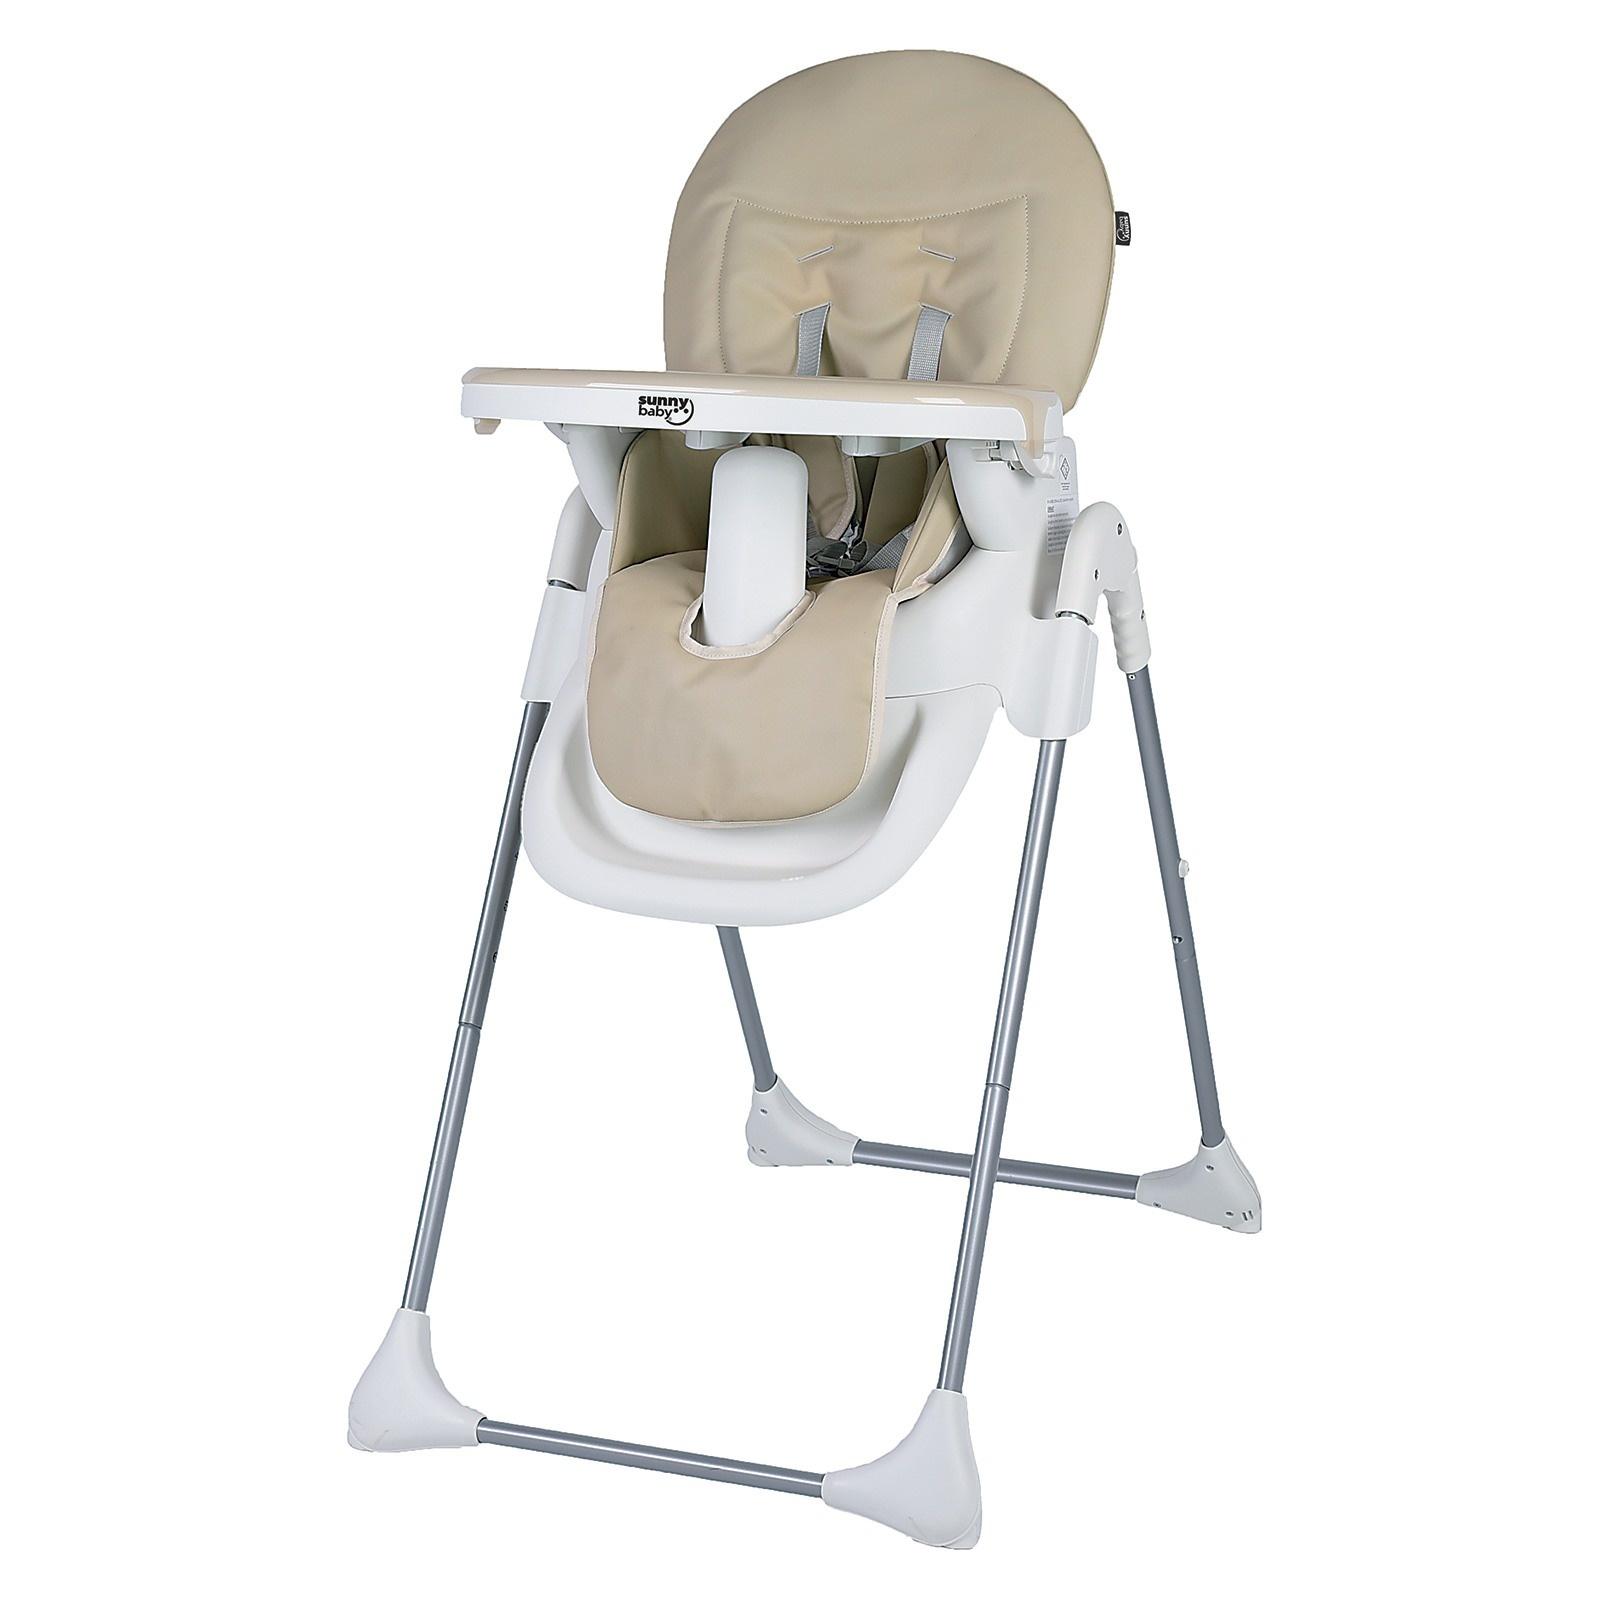 4986a6b19da6e Sunny Baby Taffy Plus Baby Feeding High Chair